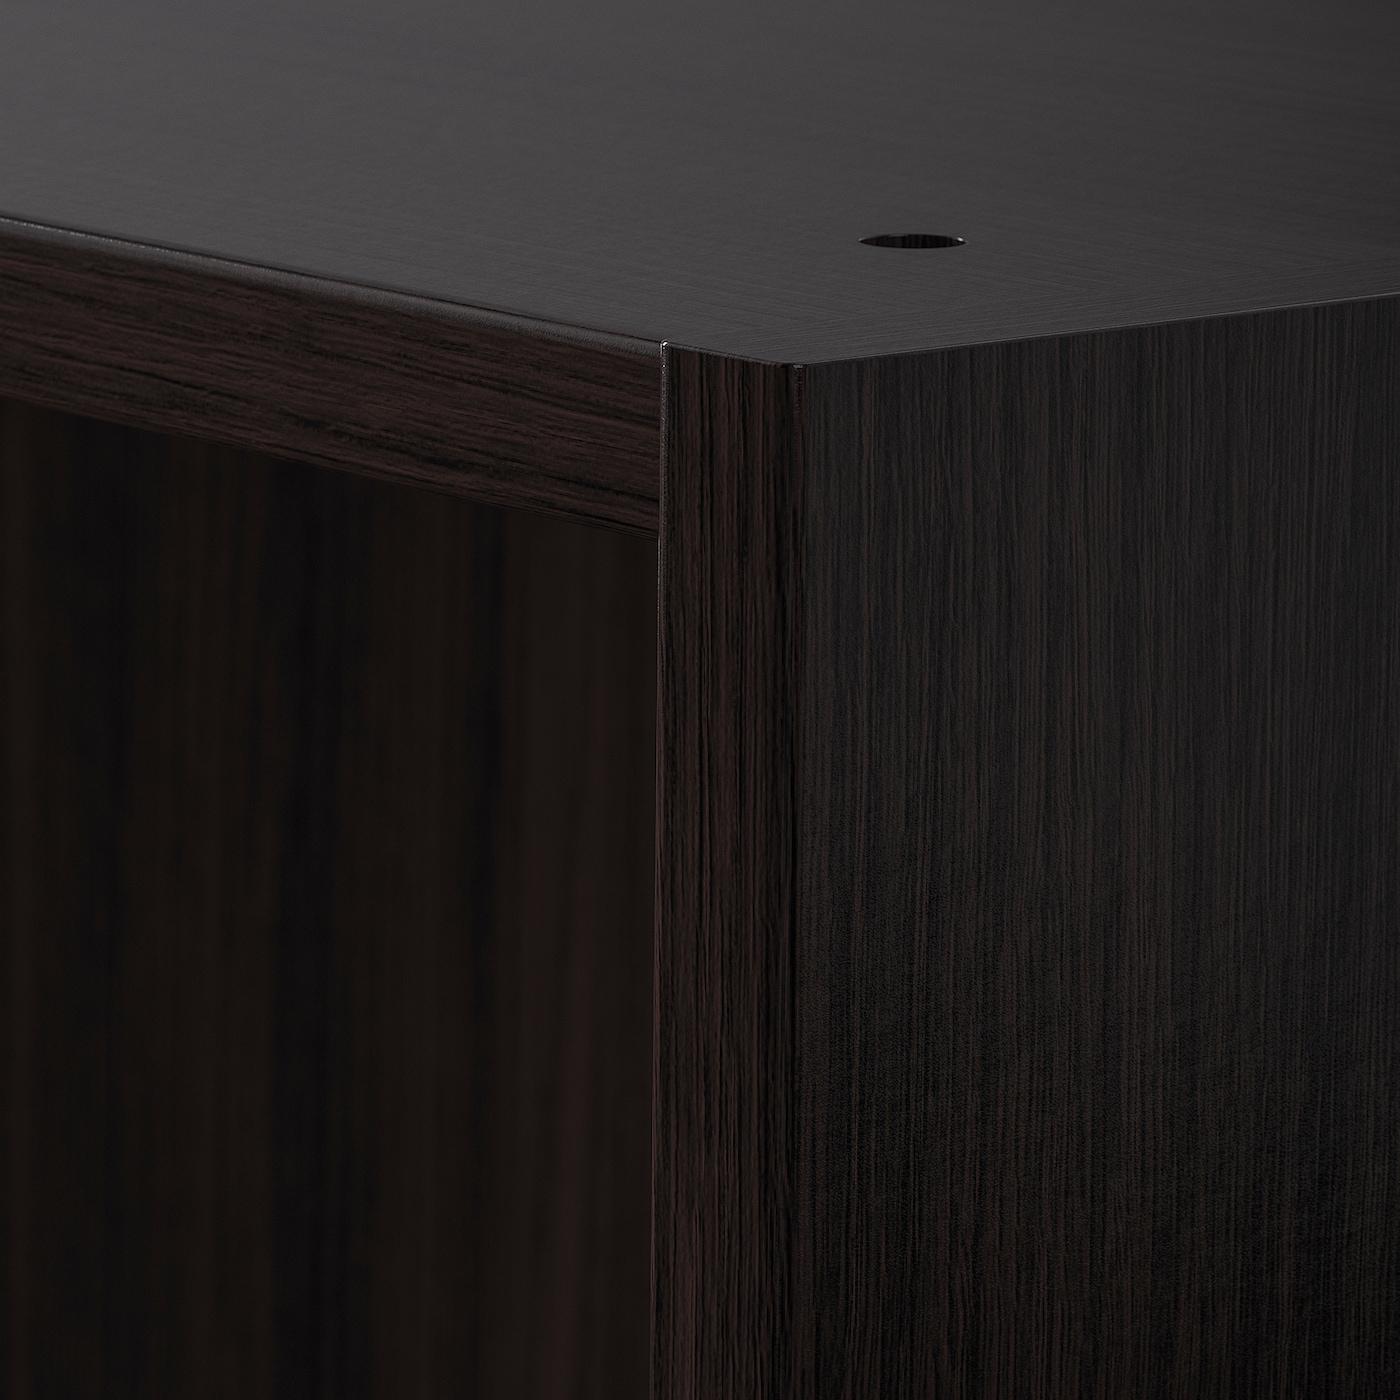 PAX Okvir garderobera, crnosmeđa, 100x58x201 cm